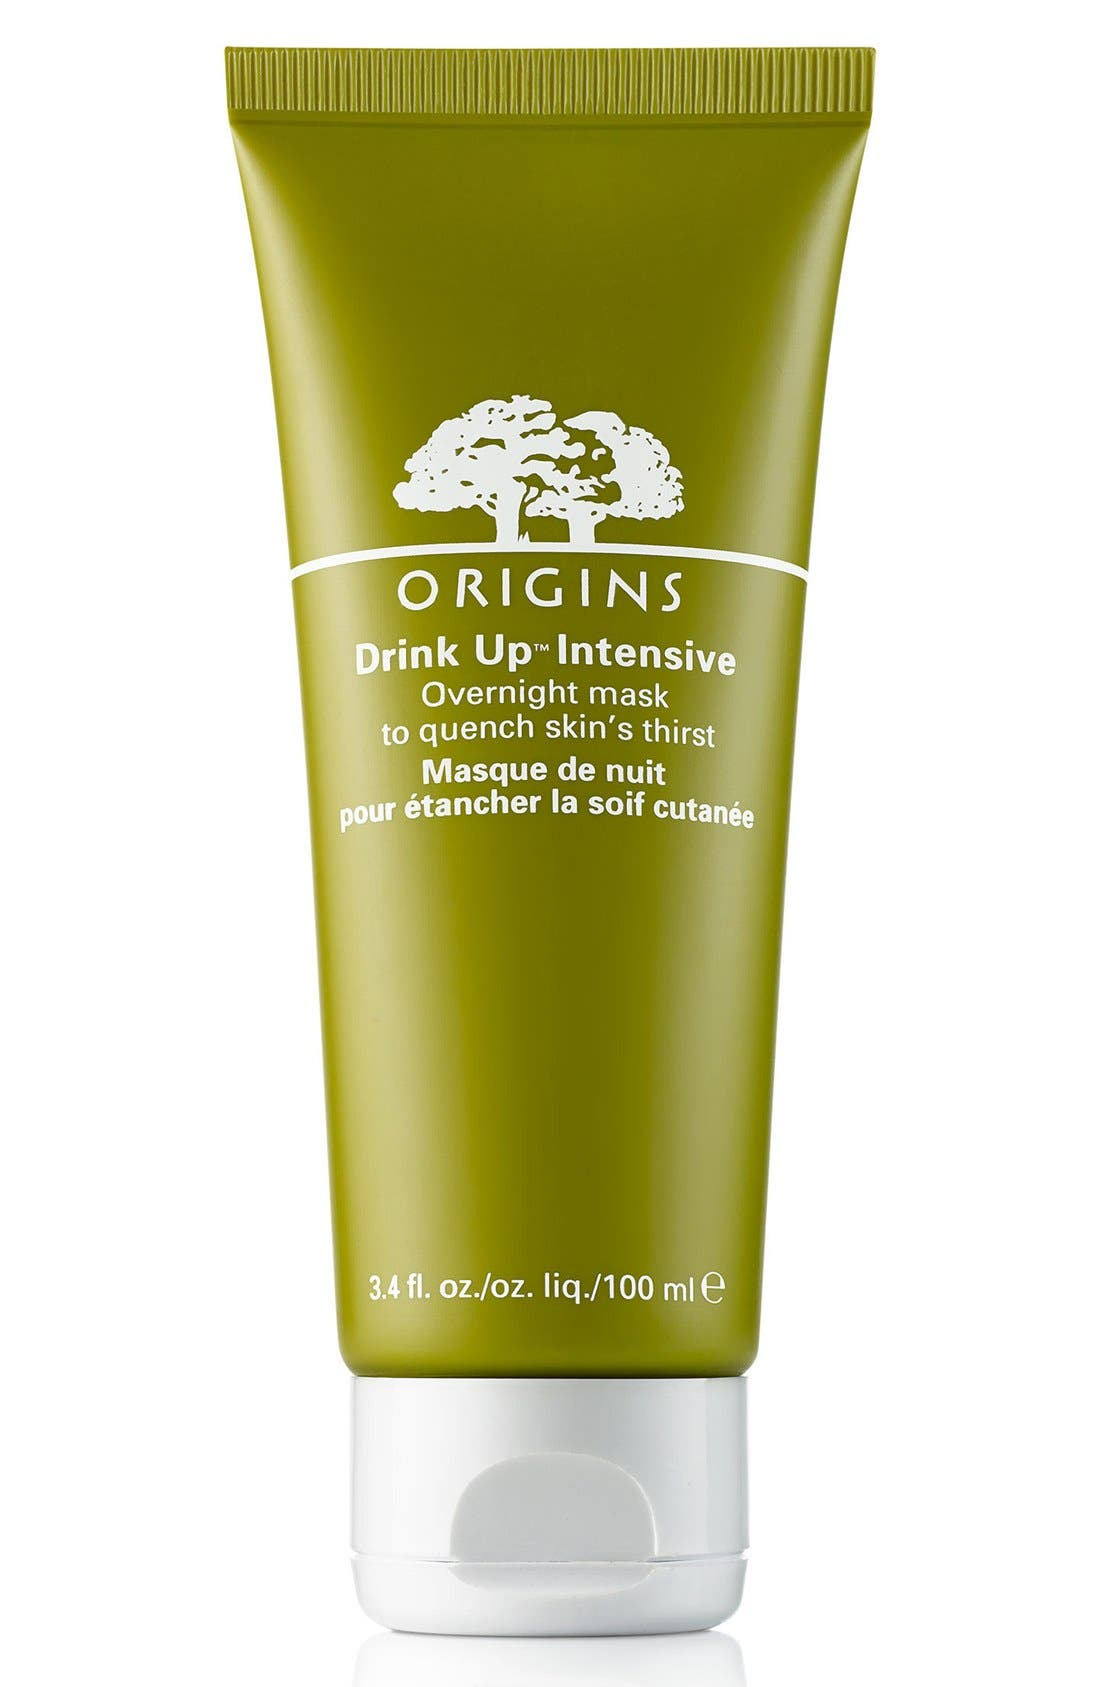 Origins Drink Up™ Intensive Overnight Mask